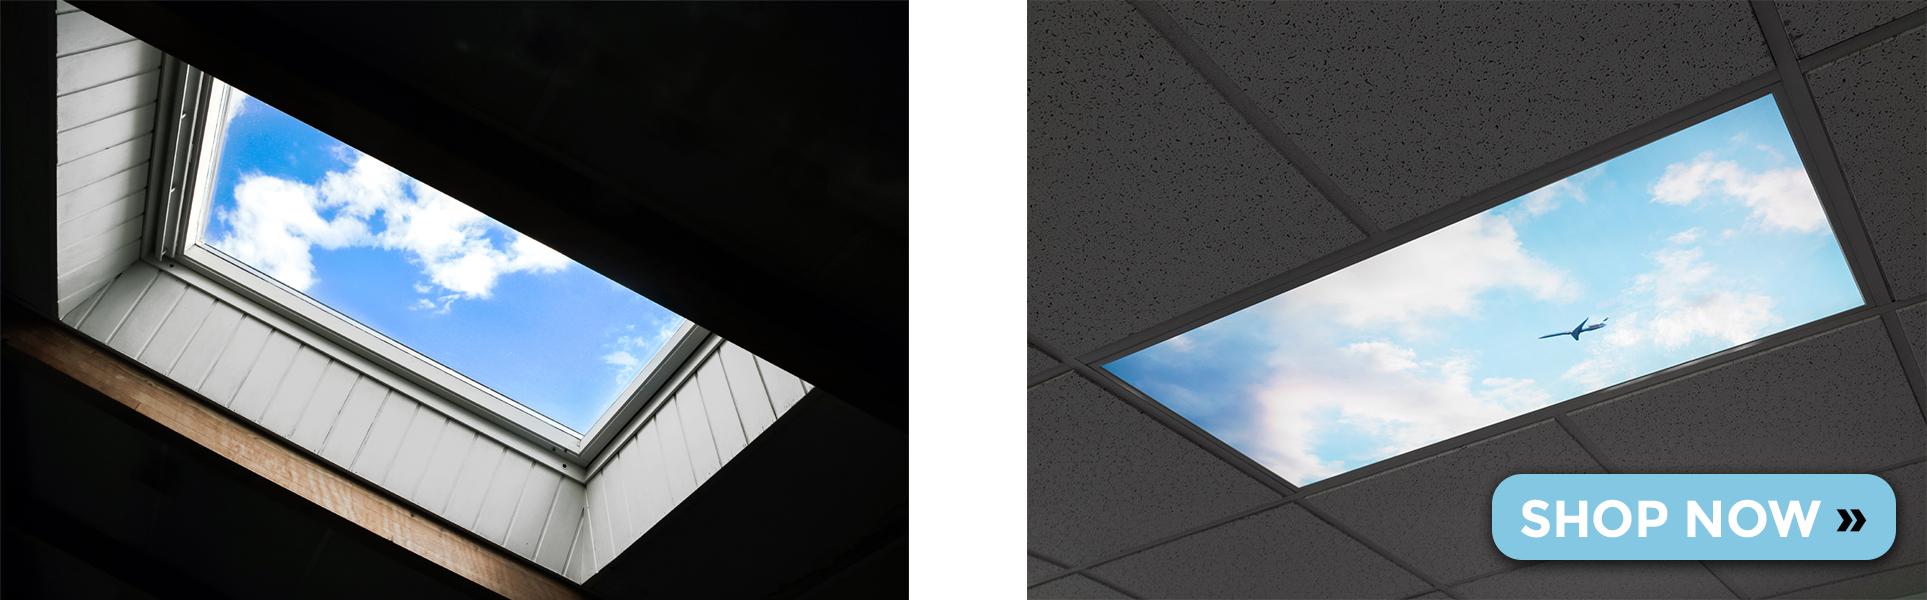 Virtual Skylights LED Panel Light comparison